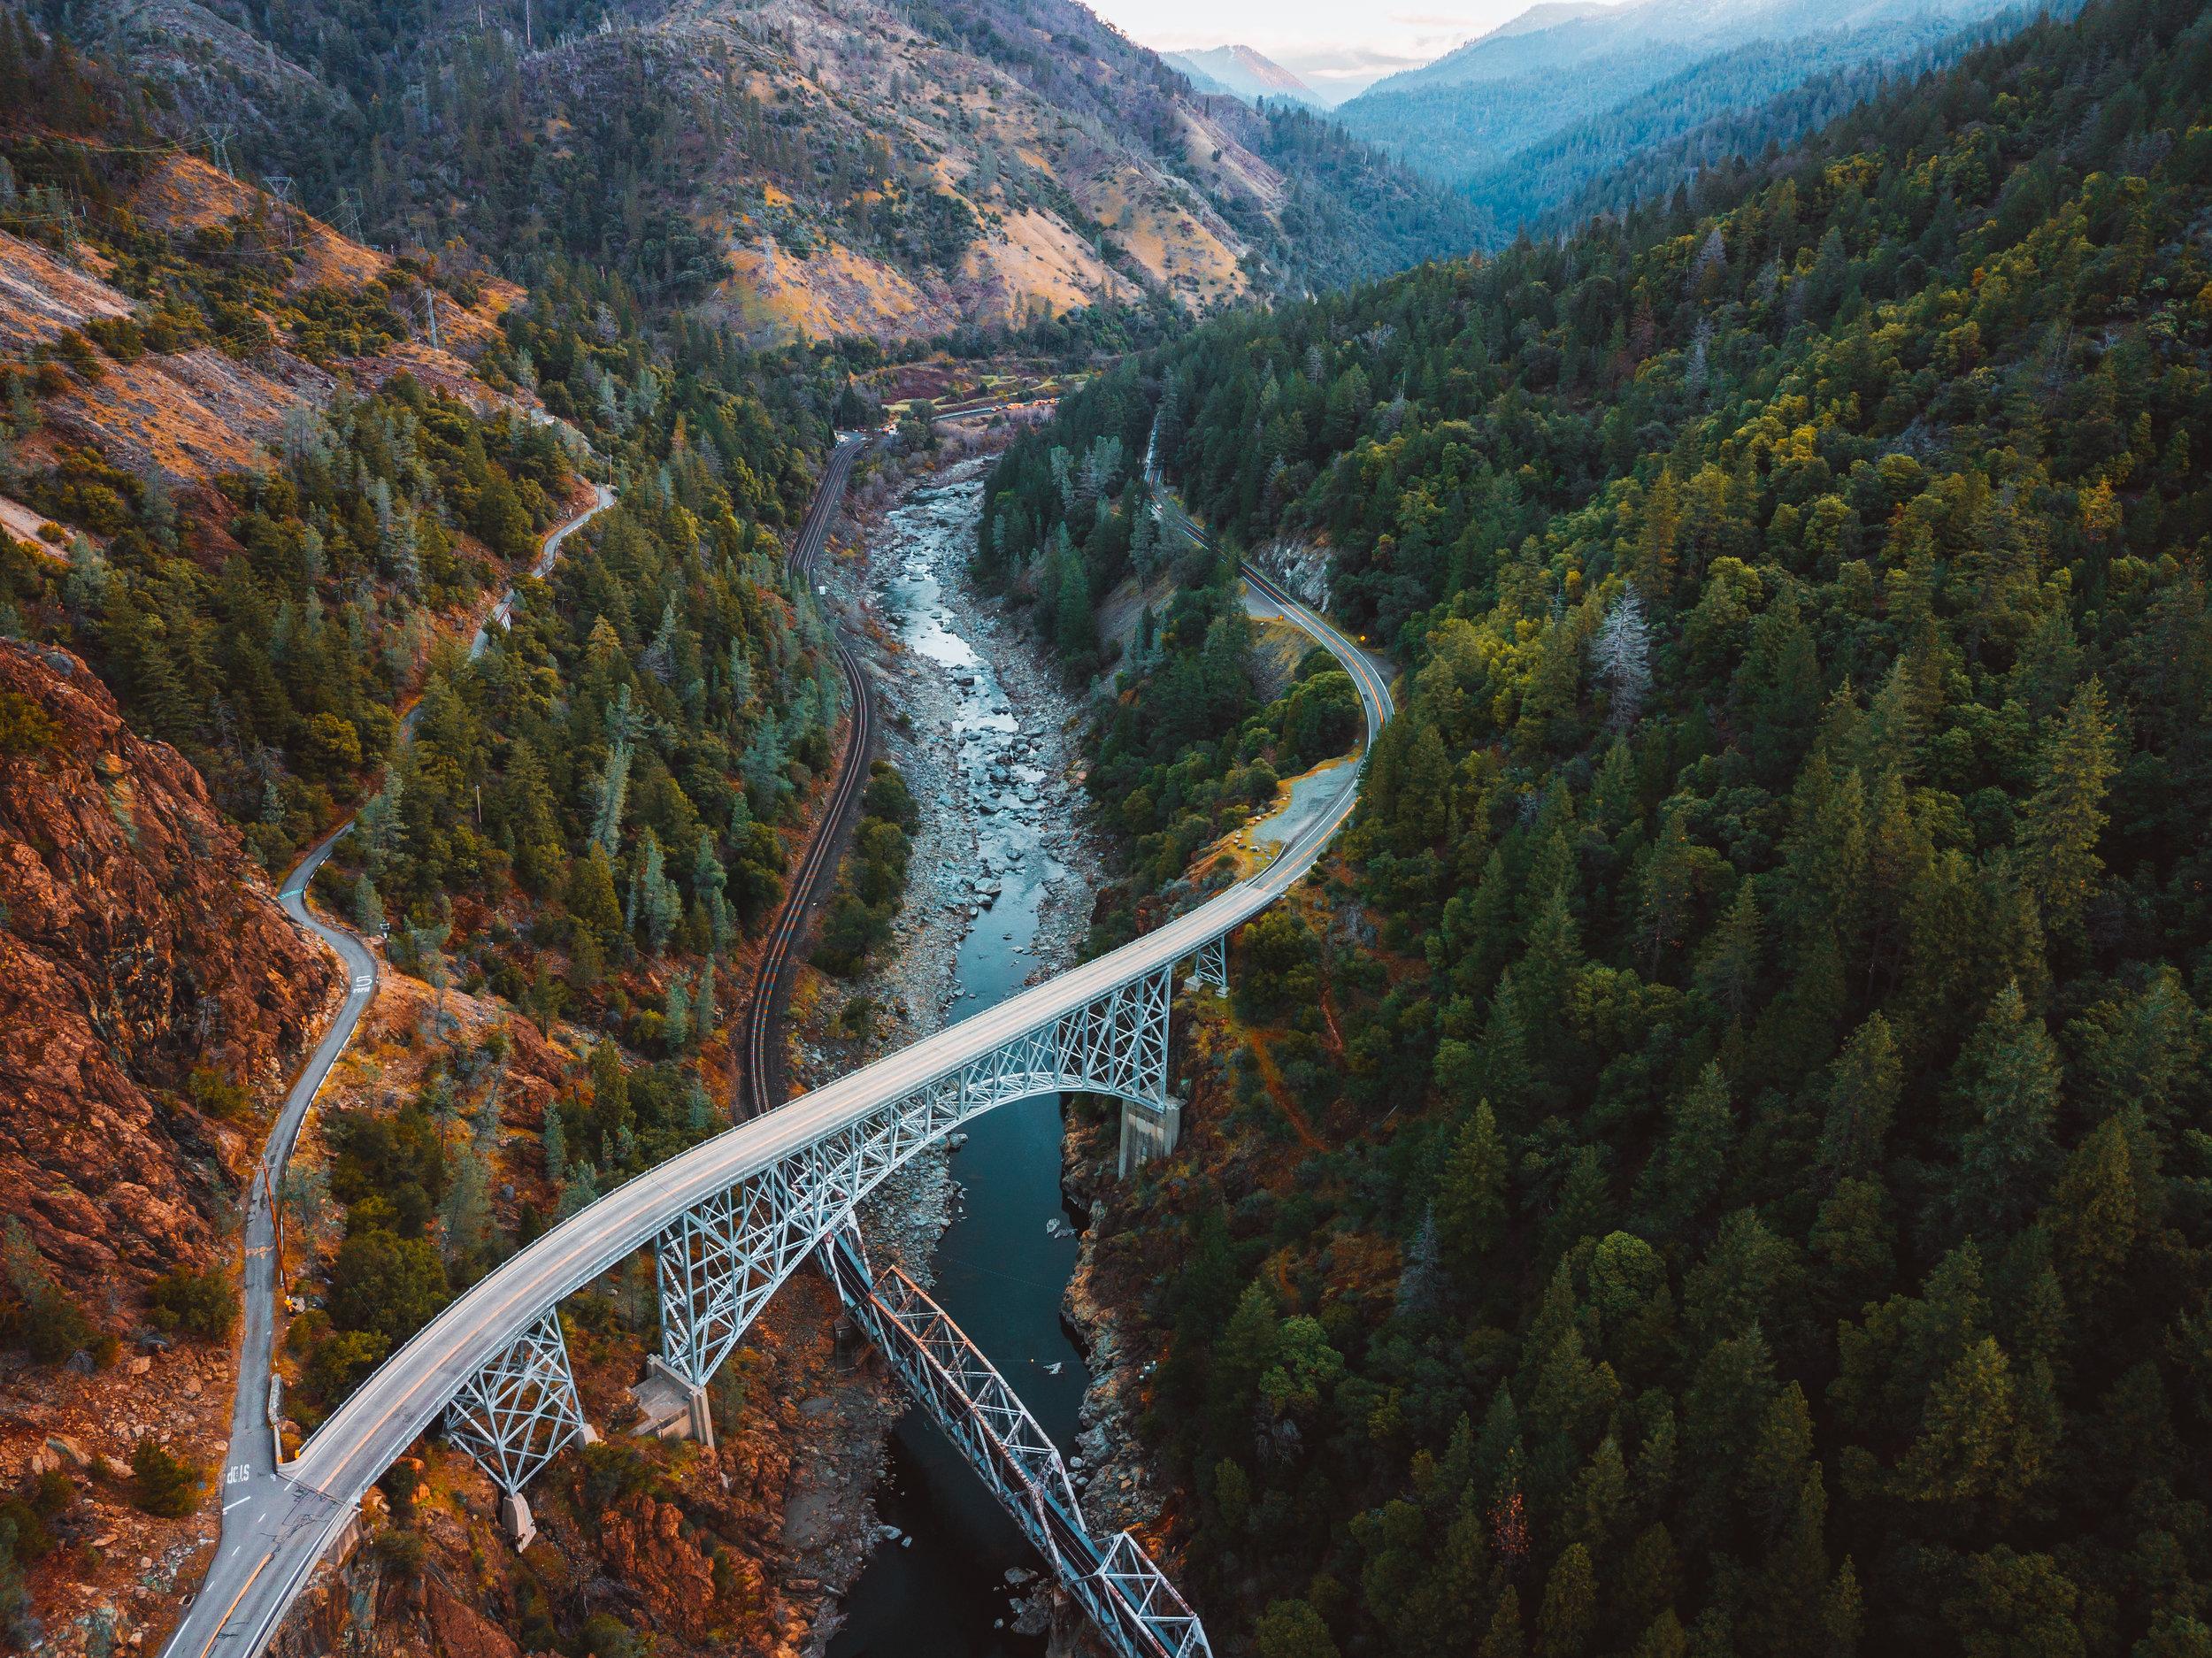 Pulga-Bridges-Glenn-Lee-Robinson-1.jpg